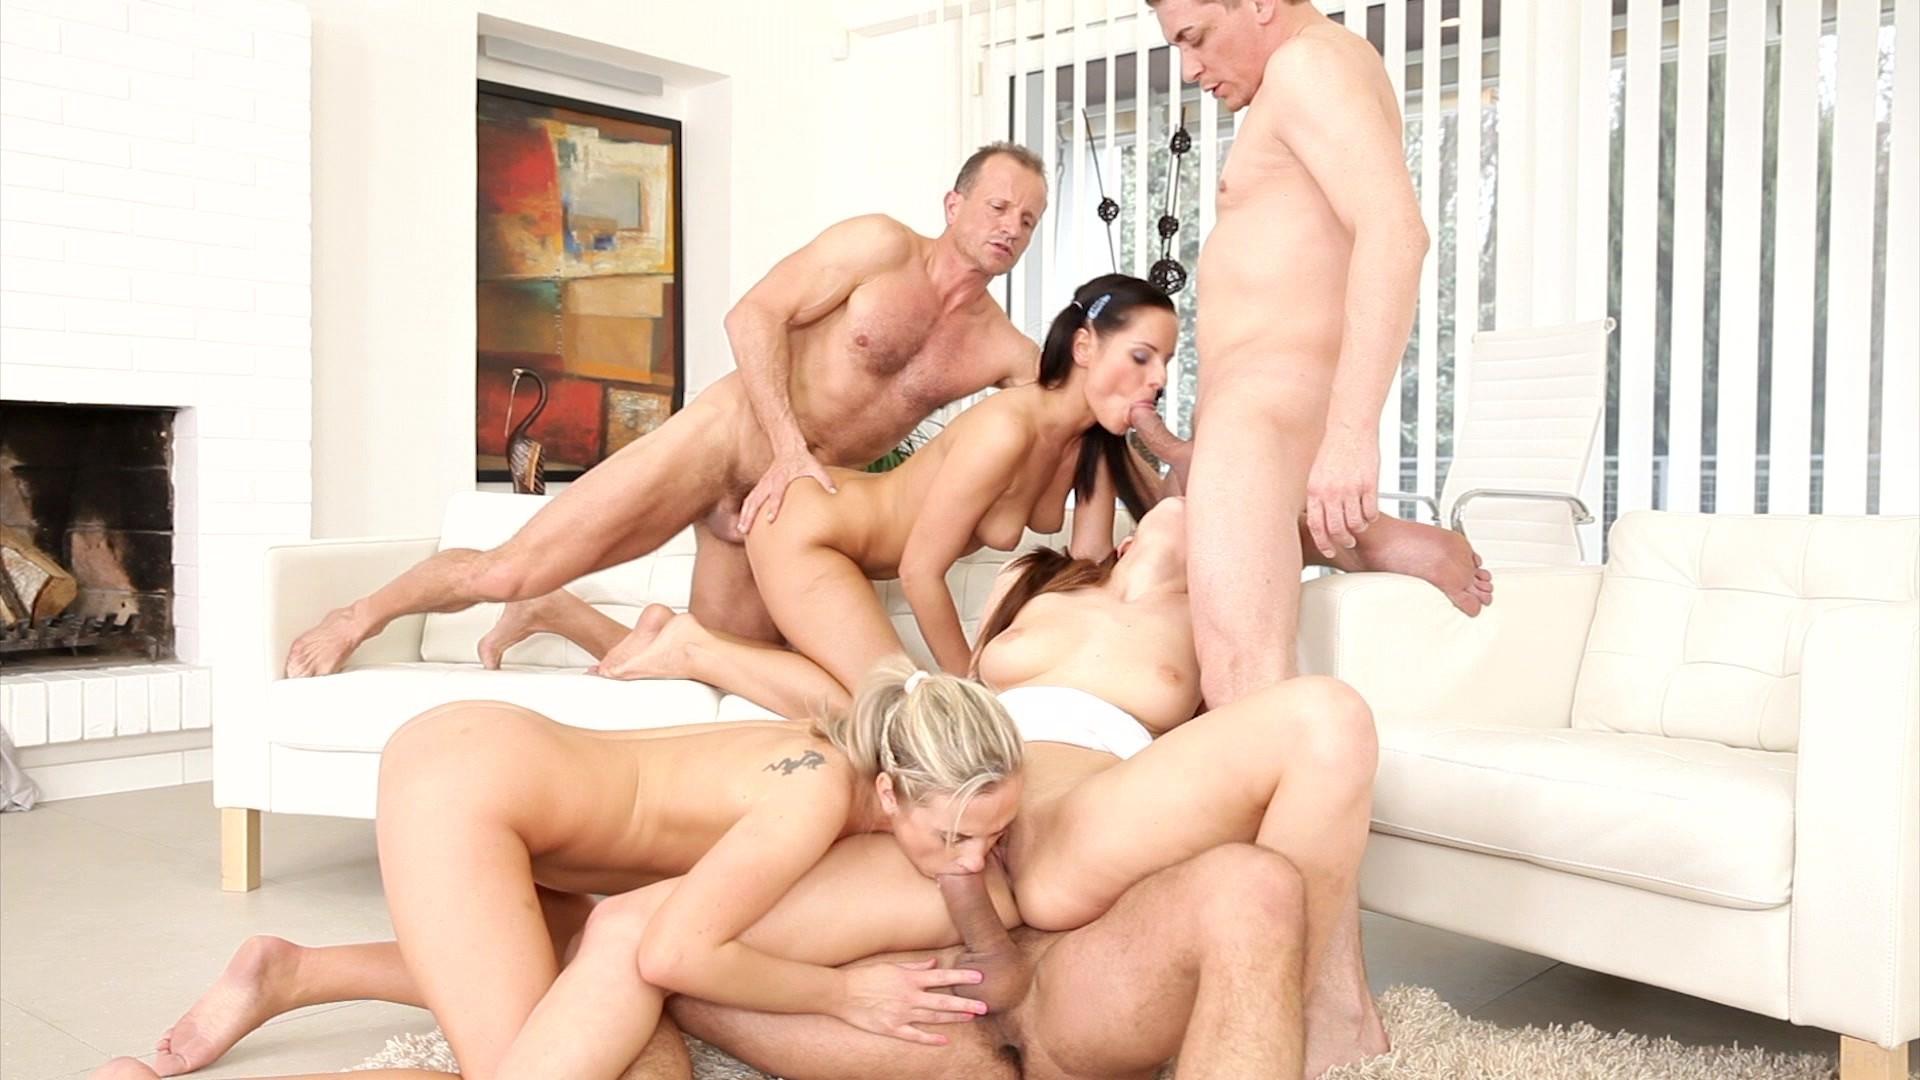 Neighbor swingers hq porn search